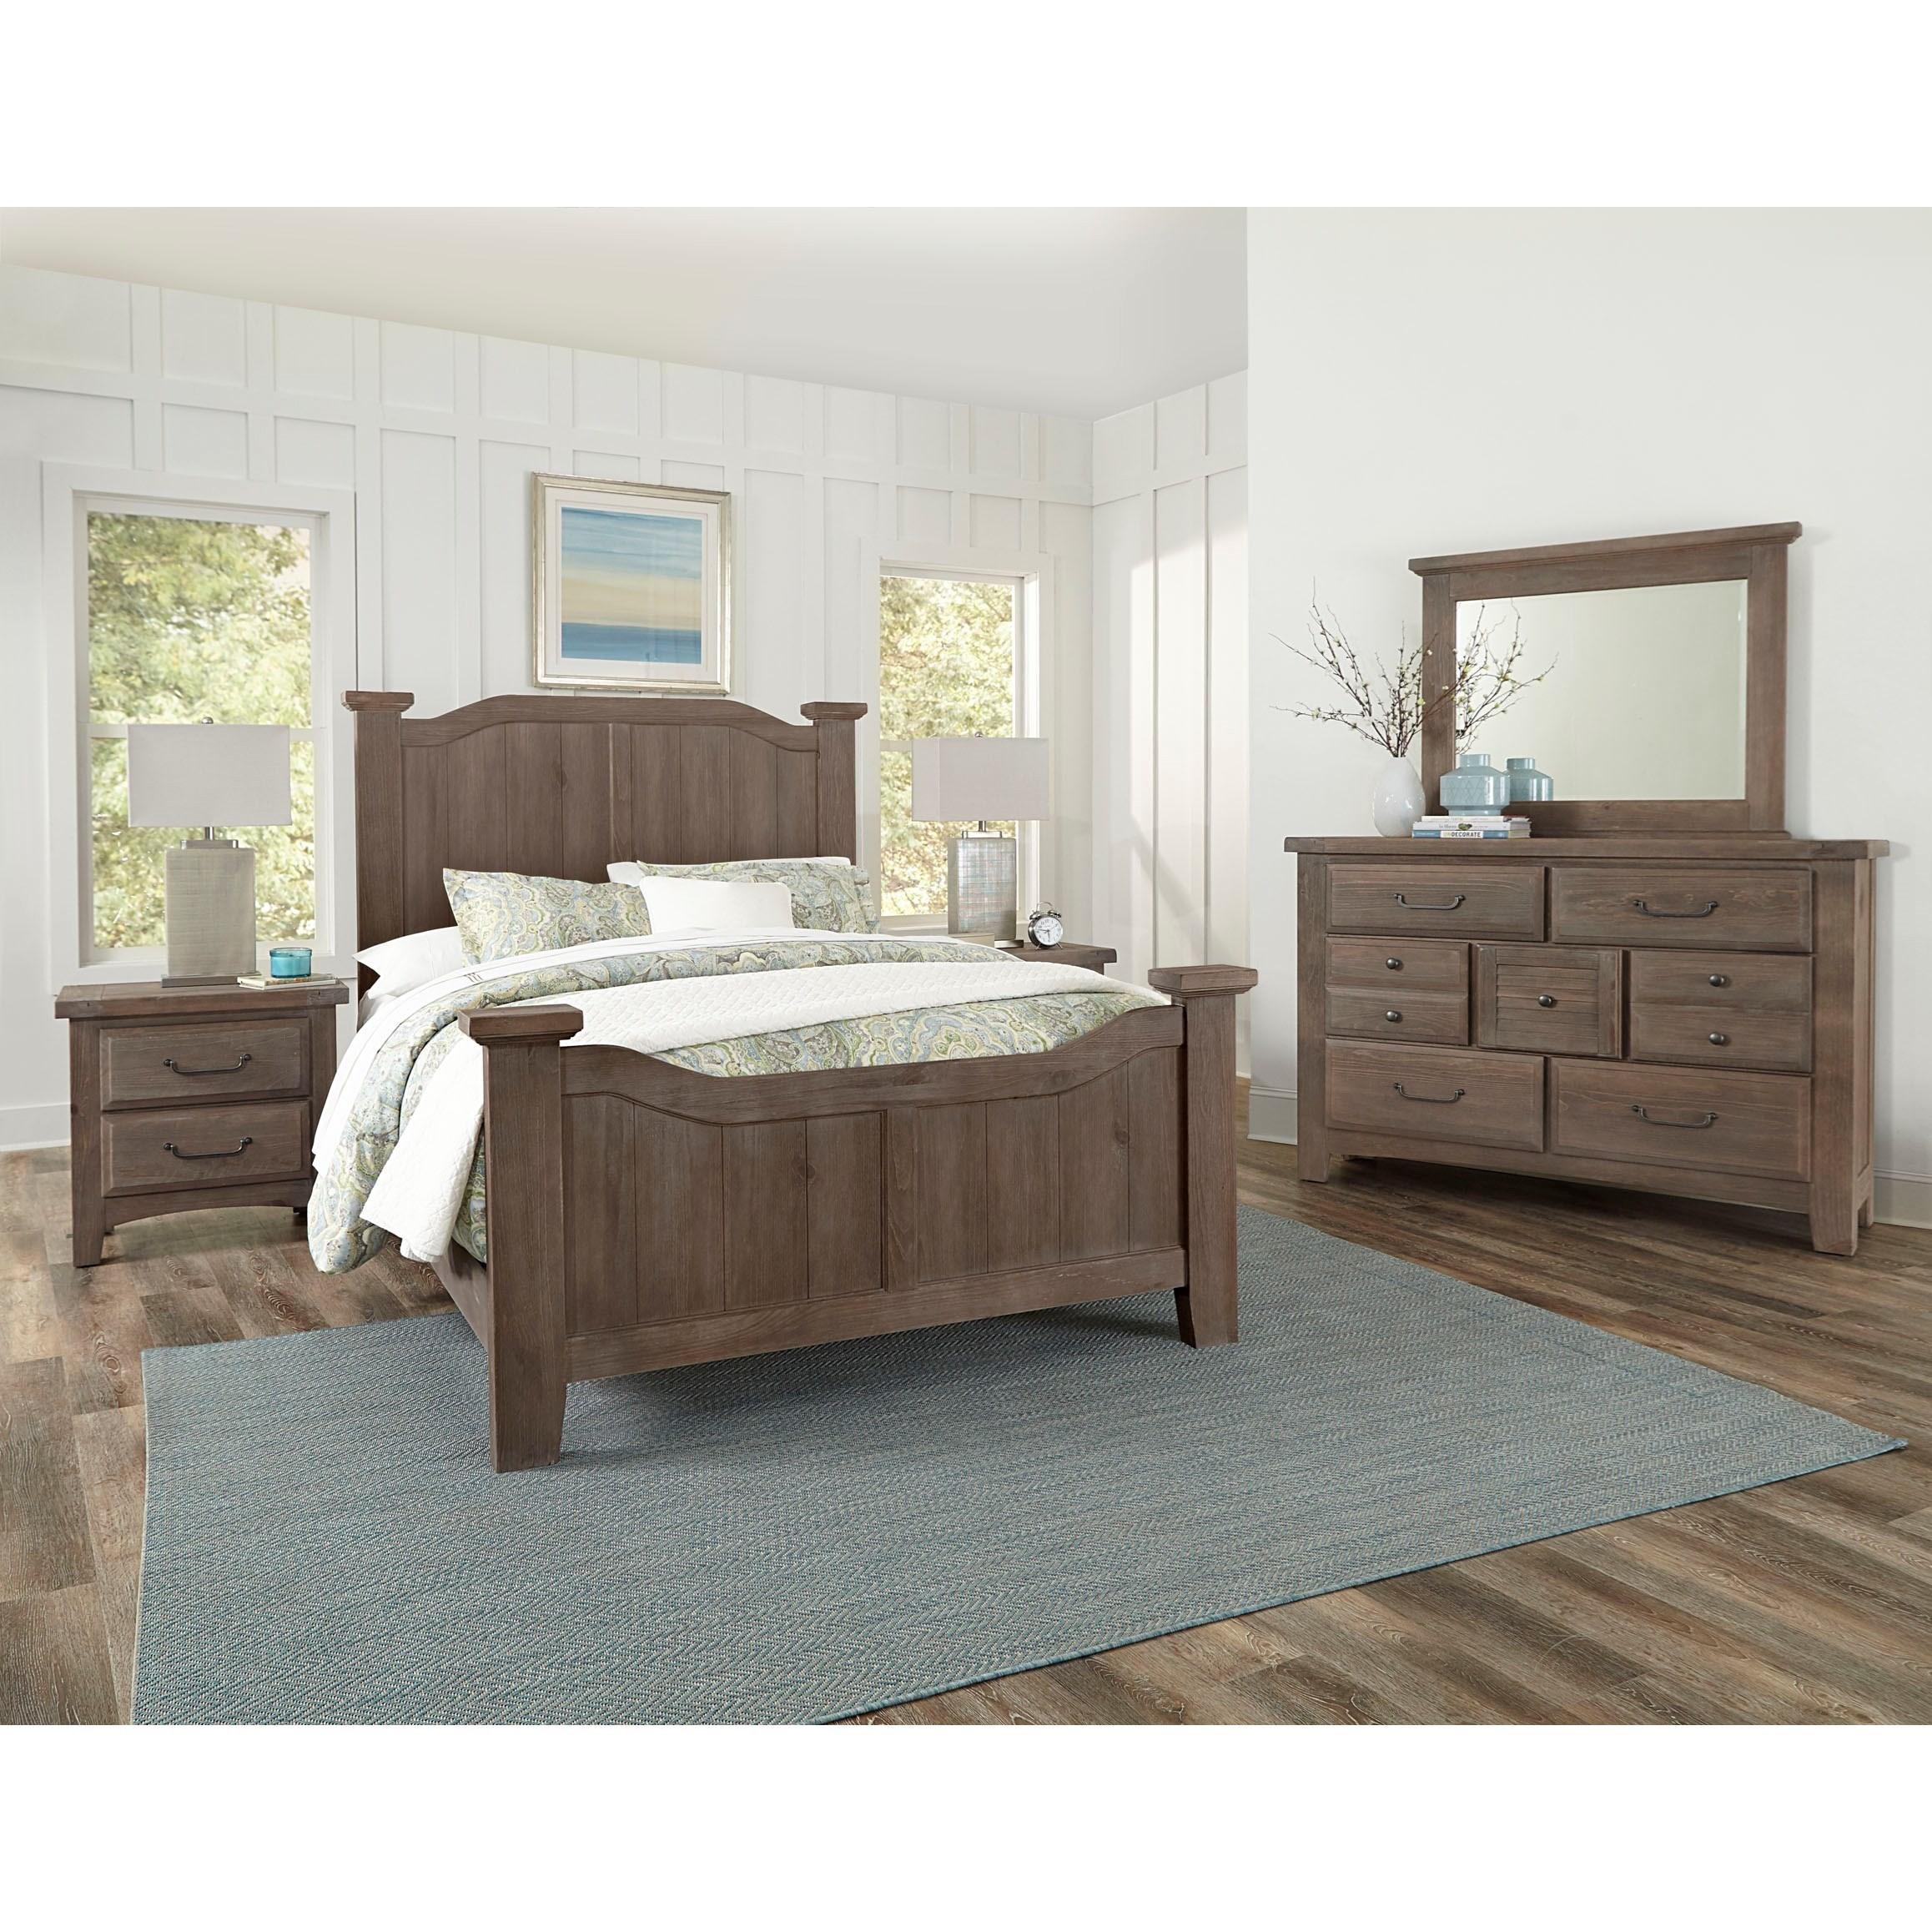 Bassett Bedroom Set: Vaughan Bassett Sawmill King Bedroom Group